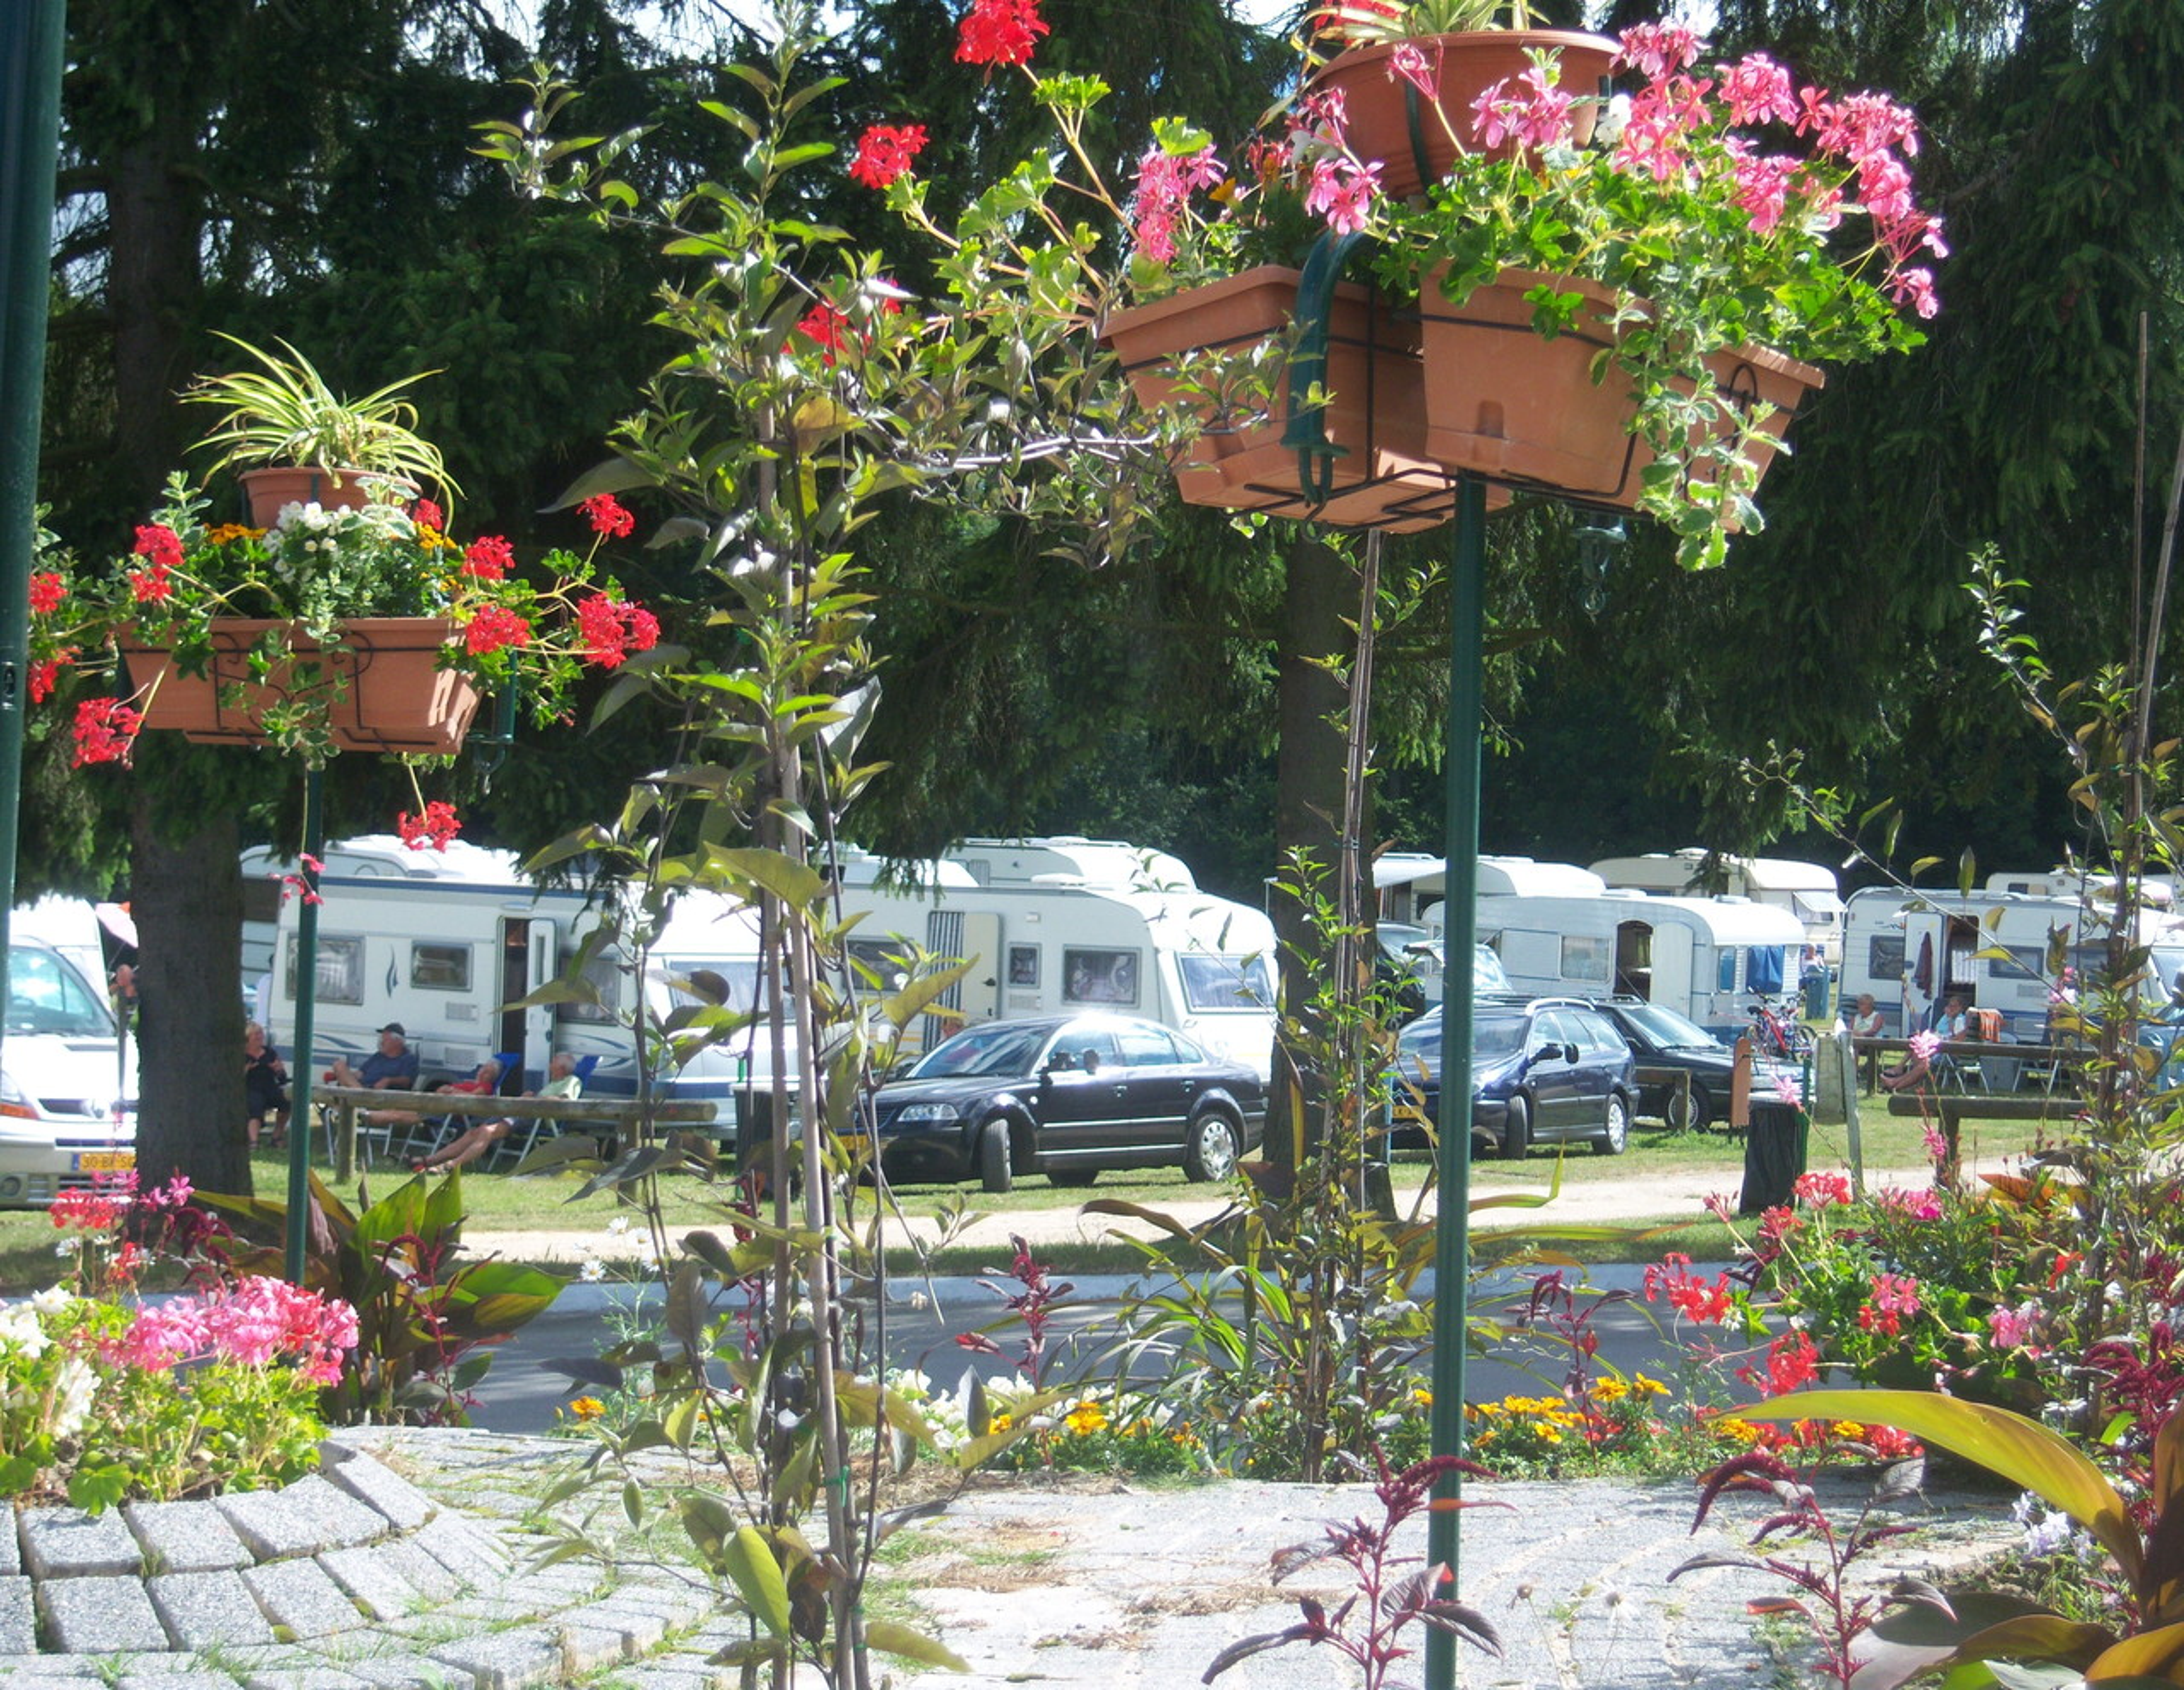 Plan du site camping les petits pr s de dourdan situ for Piscine dourdan